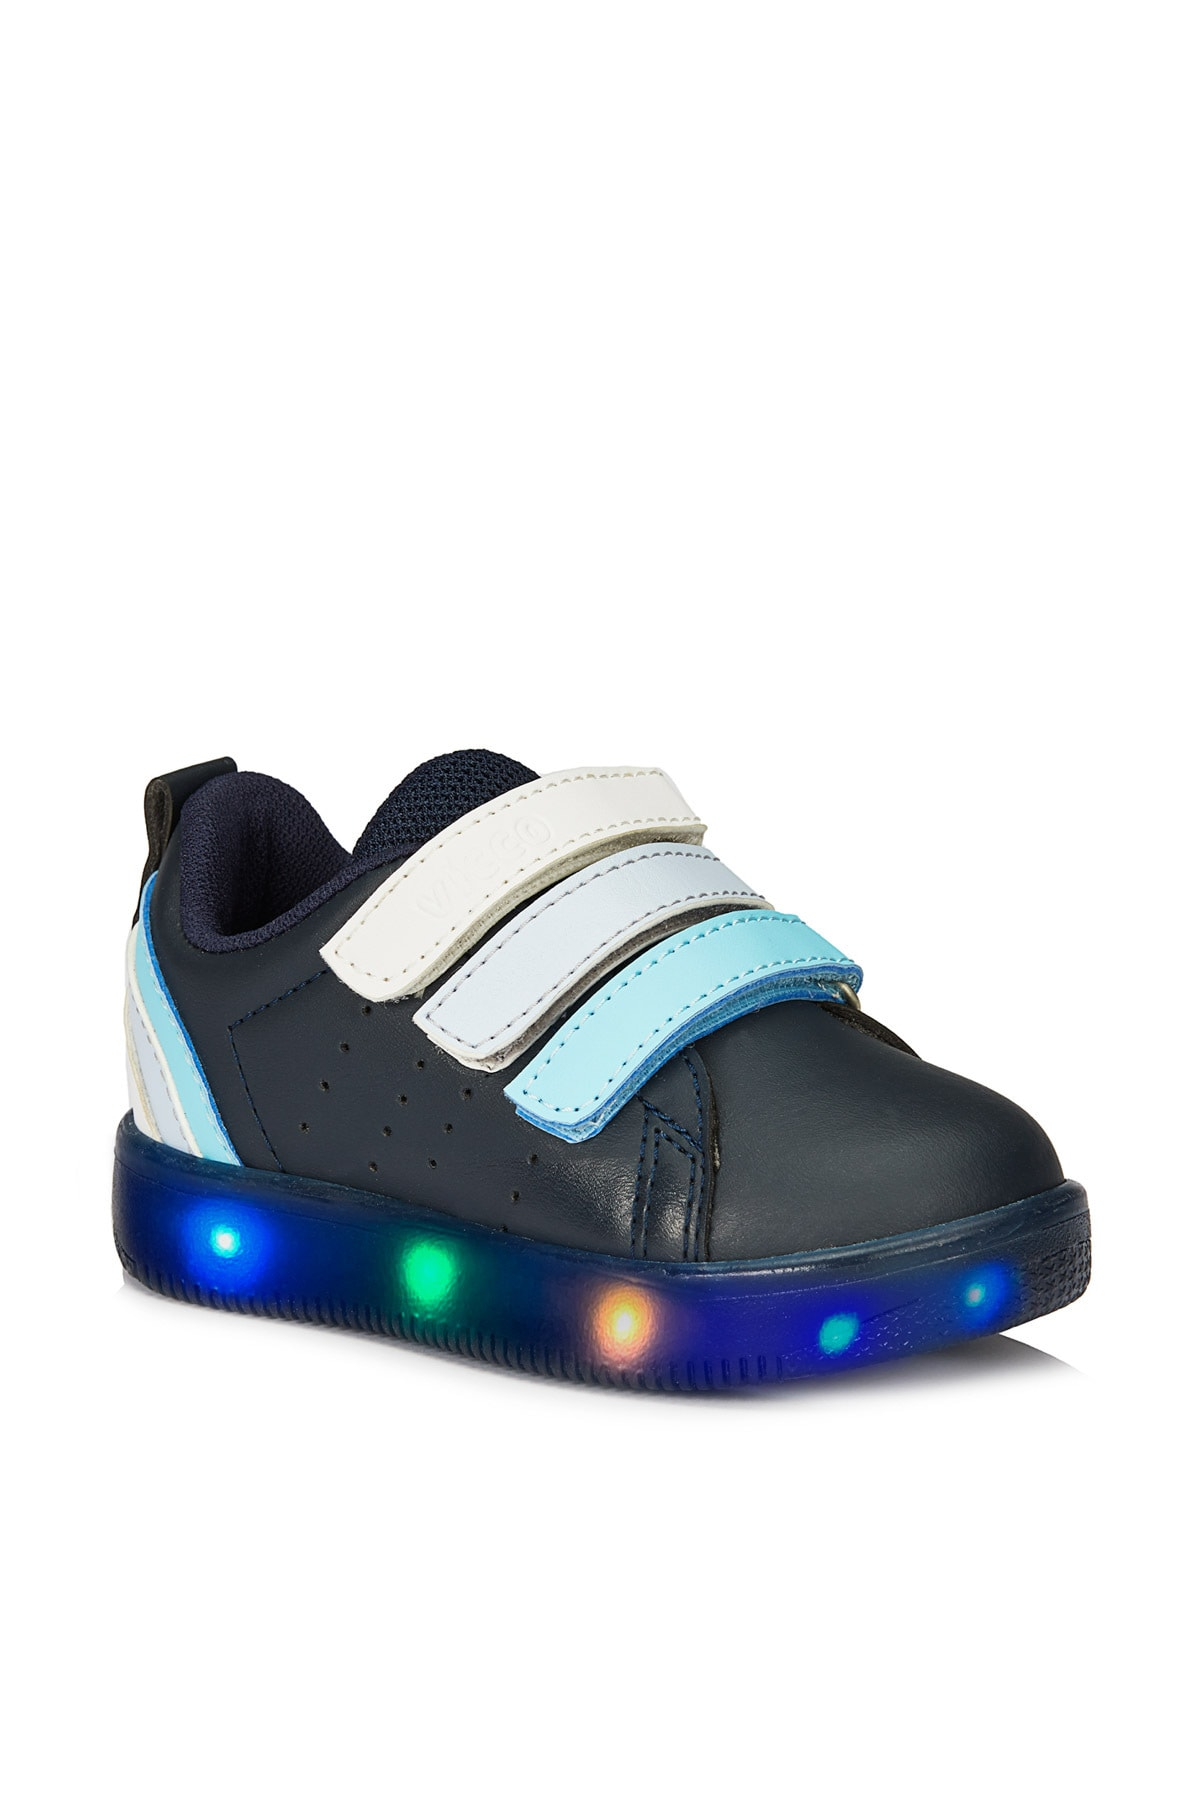 Vicco Sun Erkek Bebe Lacivert Sneaker 1